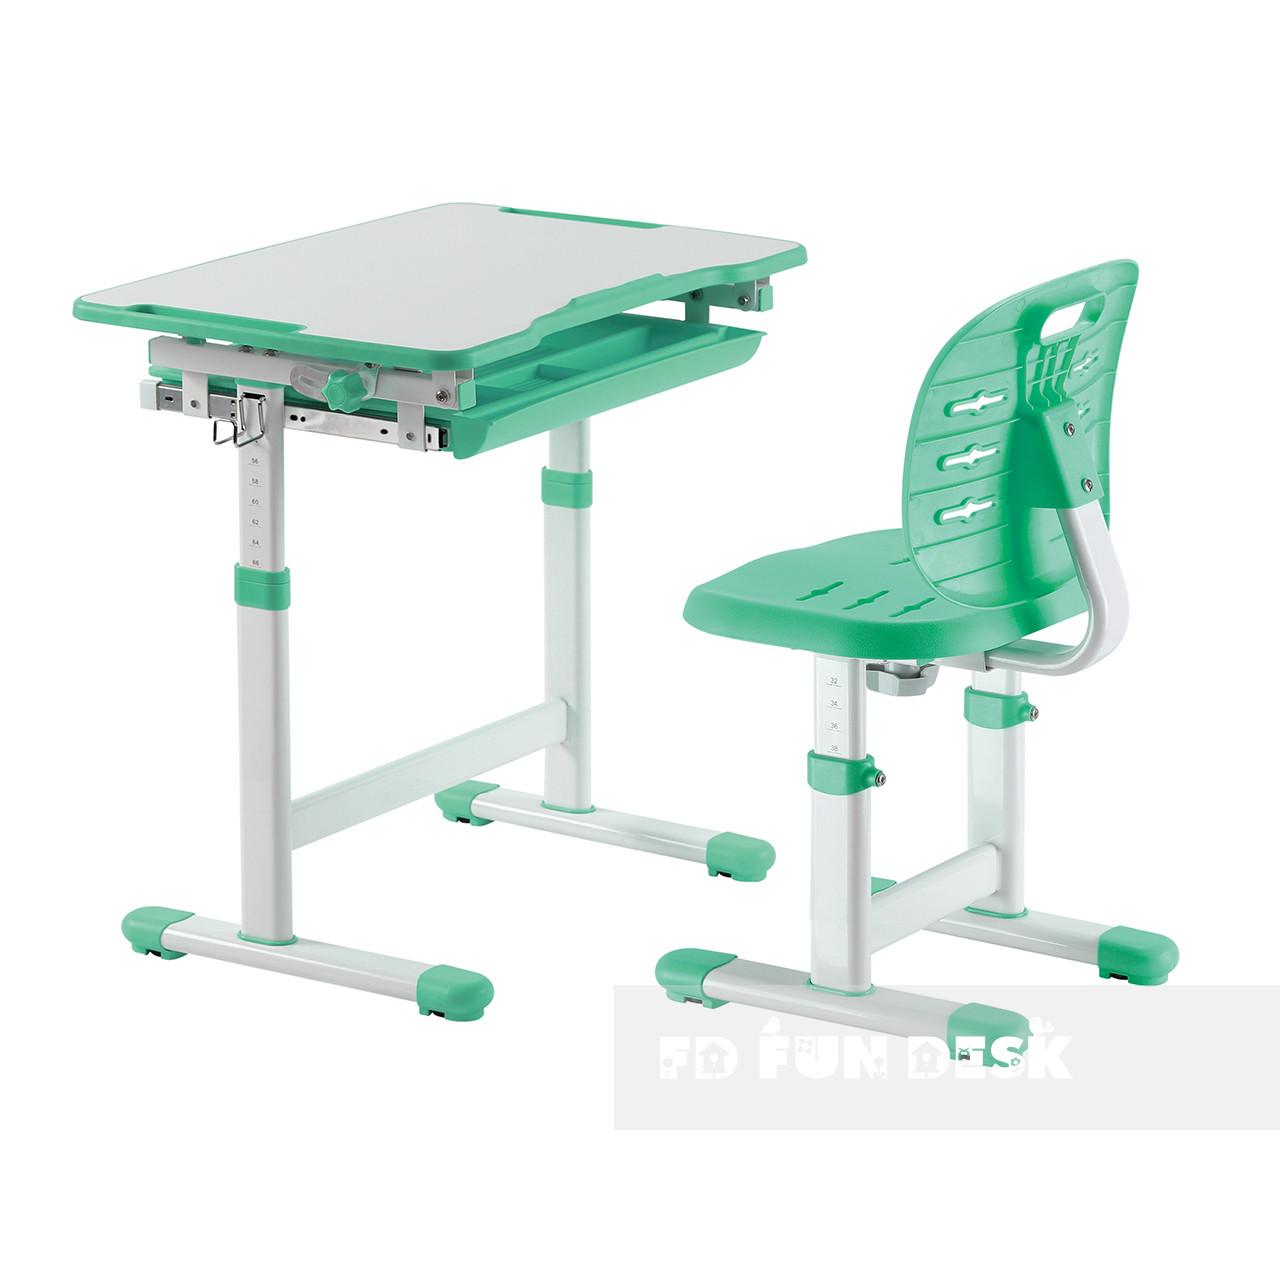 Комплект парта + стул трансформеры Piccolino III Green FunDesk - ОПТОМ ДЛЯ ШКОЛ